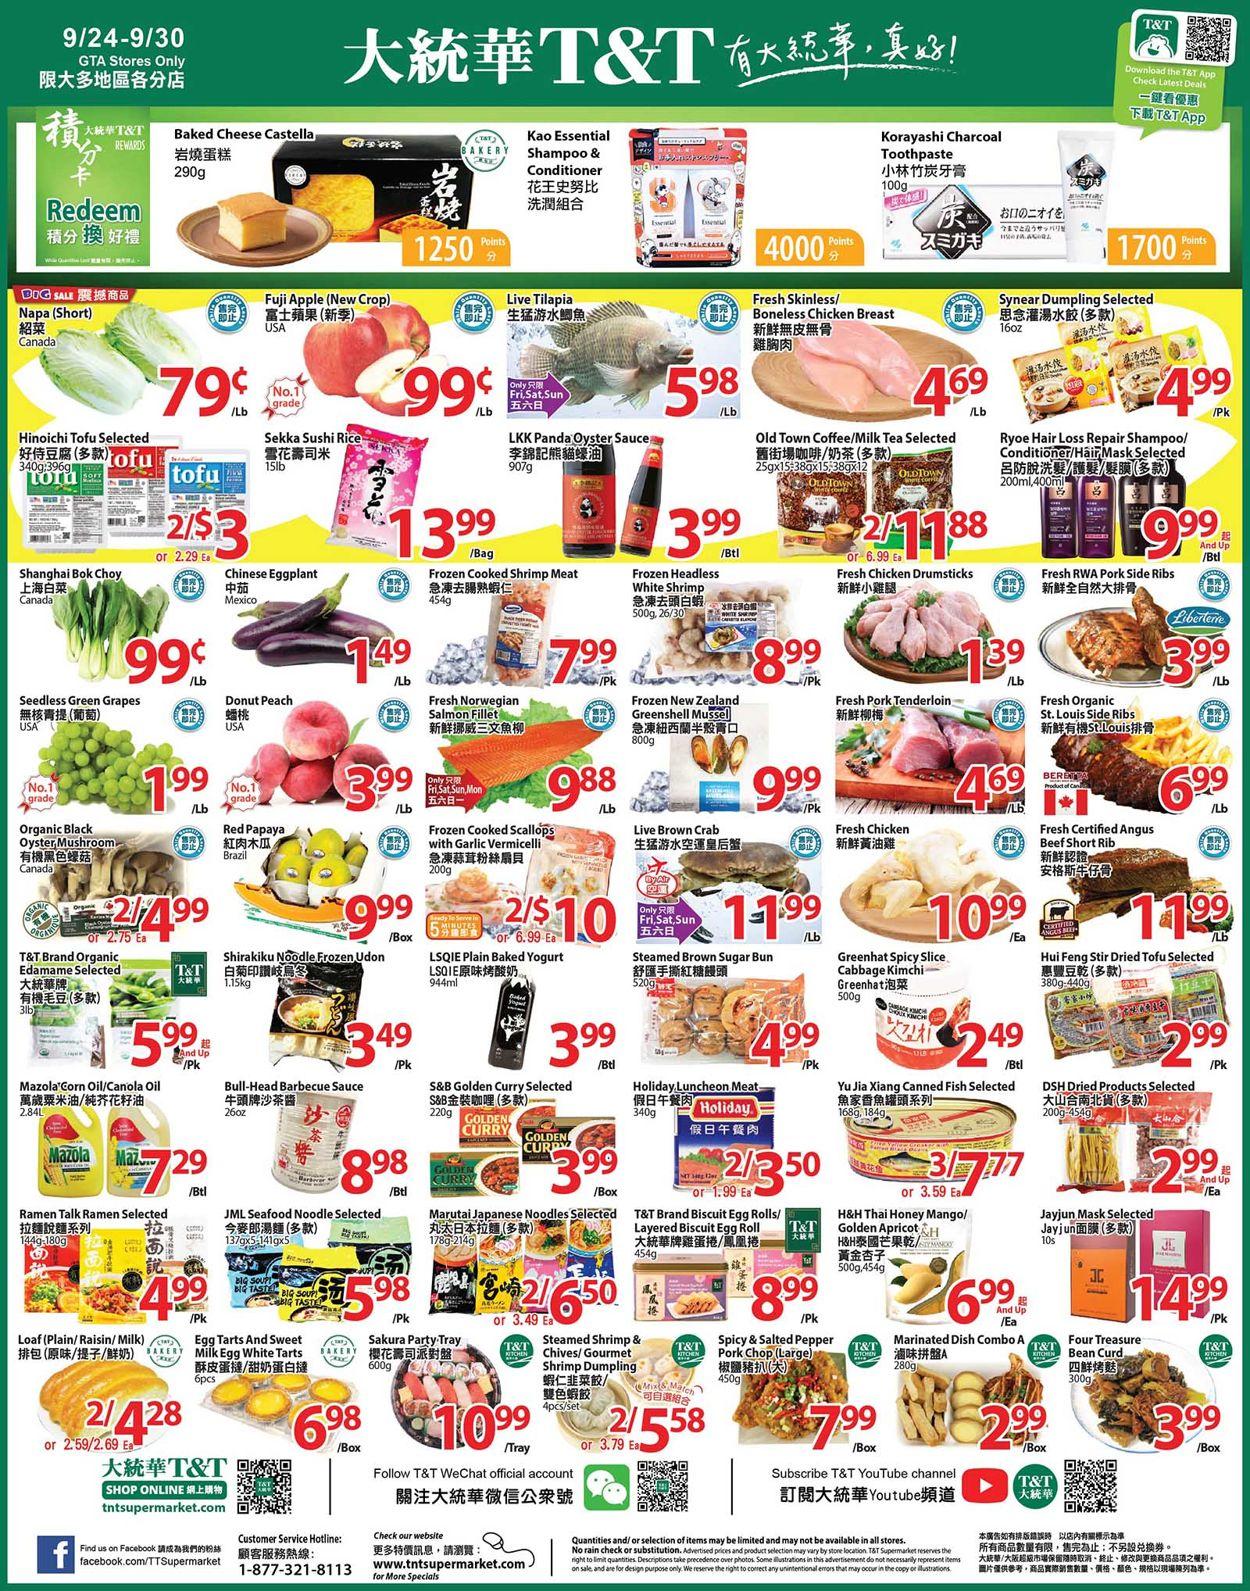 T&T Supermarket - Greater Toronto Area Flyer - 09/24-09/30/2021